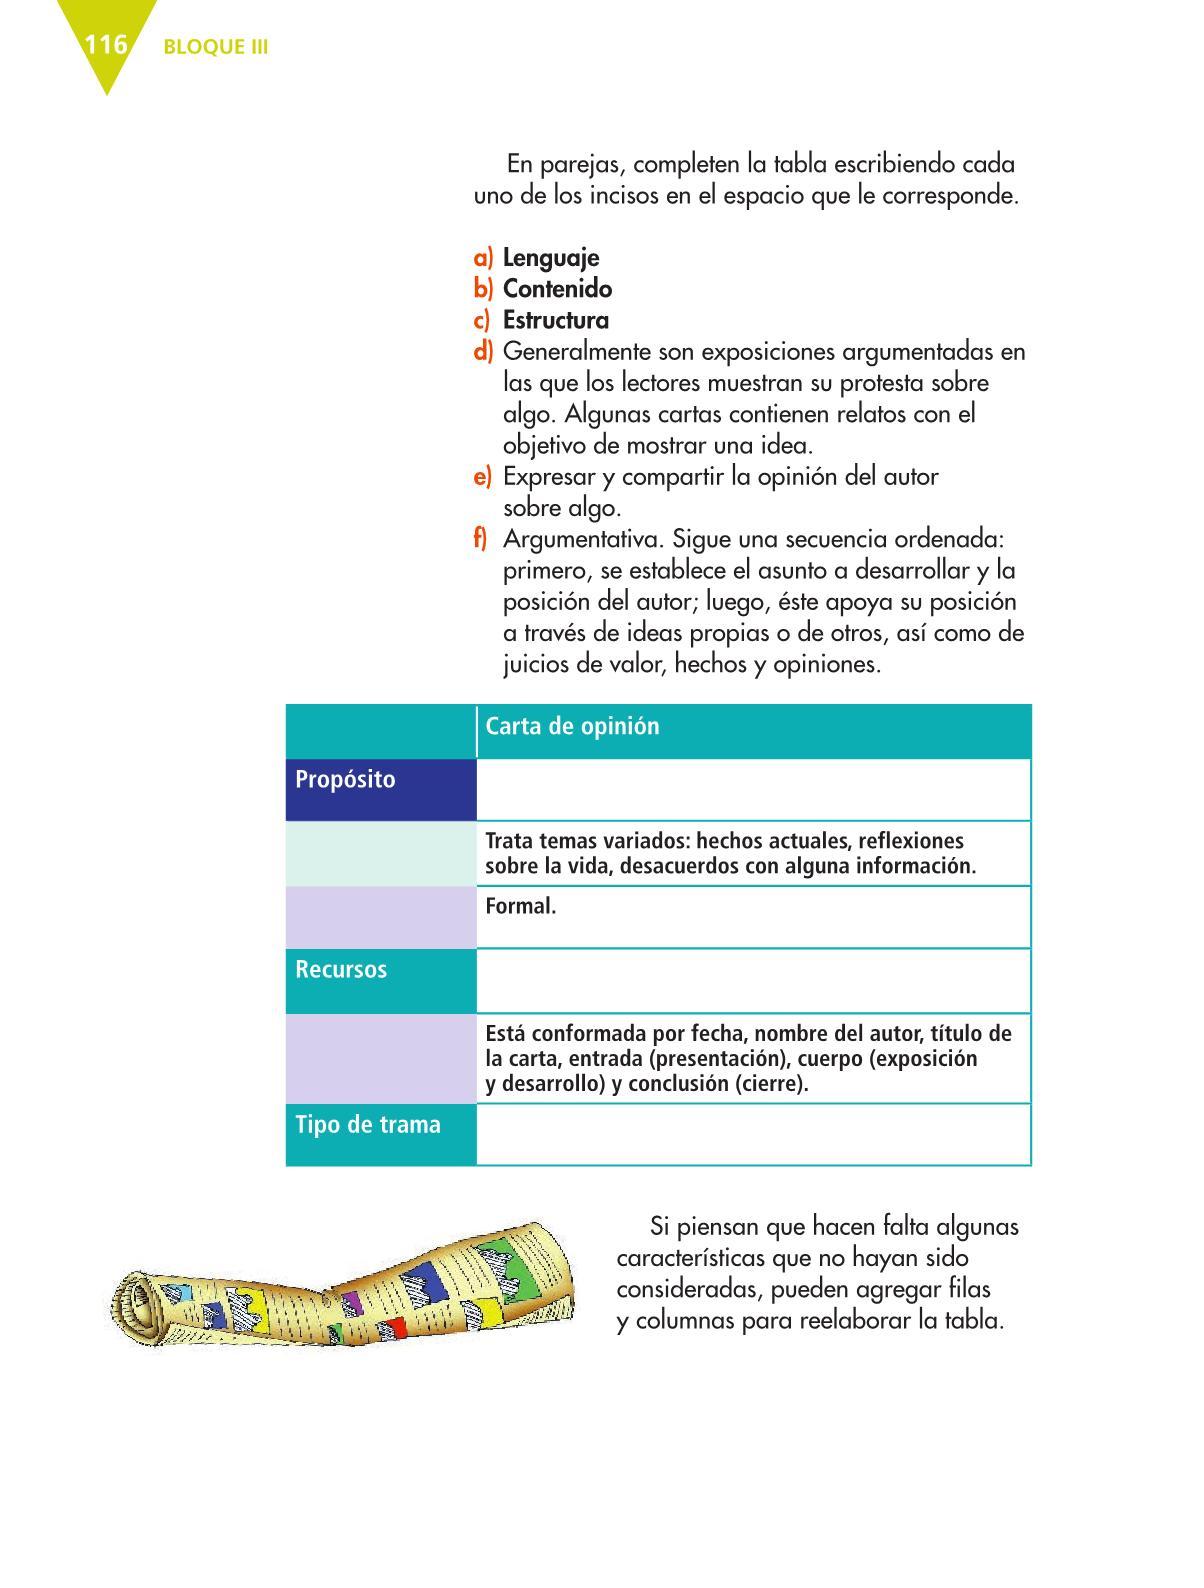 Español Sexto grado 2016-2017 - Online - Página 116 de 184 ...